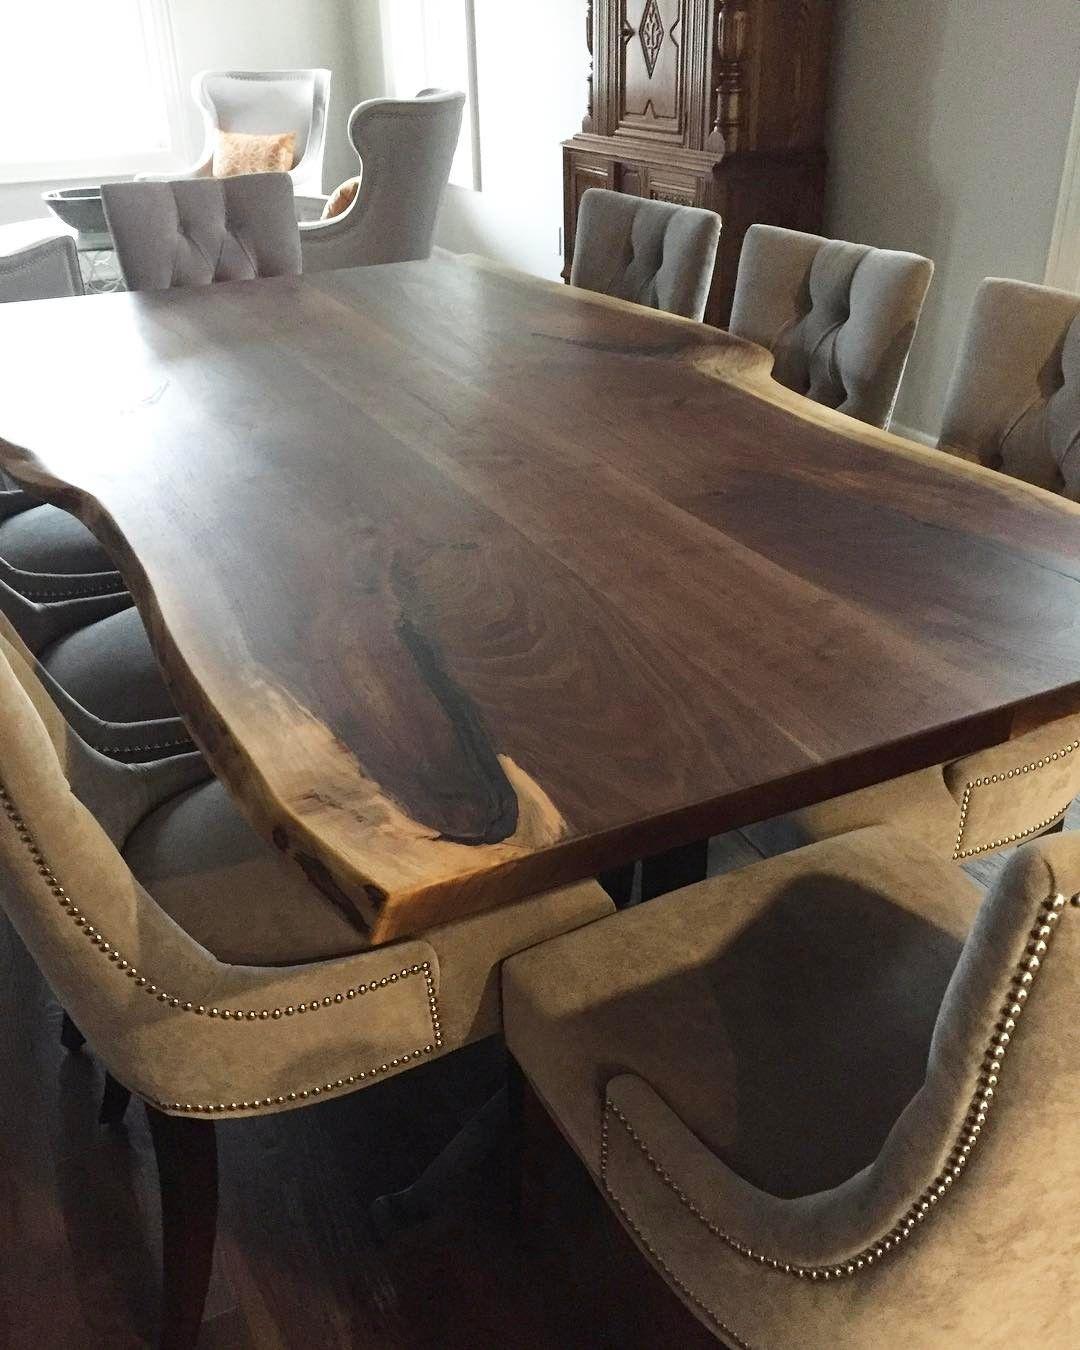 Superb Pin By Jonny Brew On Natural Wood Table Table Chairs Creativecarmelina Interior Chair Design Creativecarmelinacom